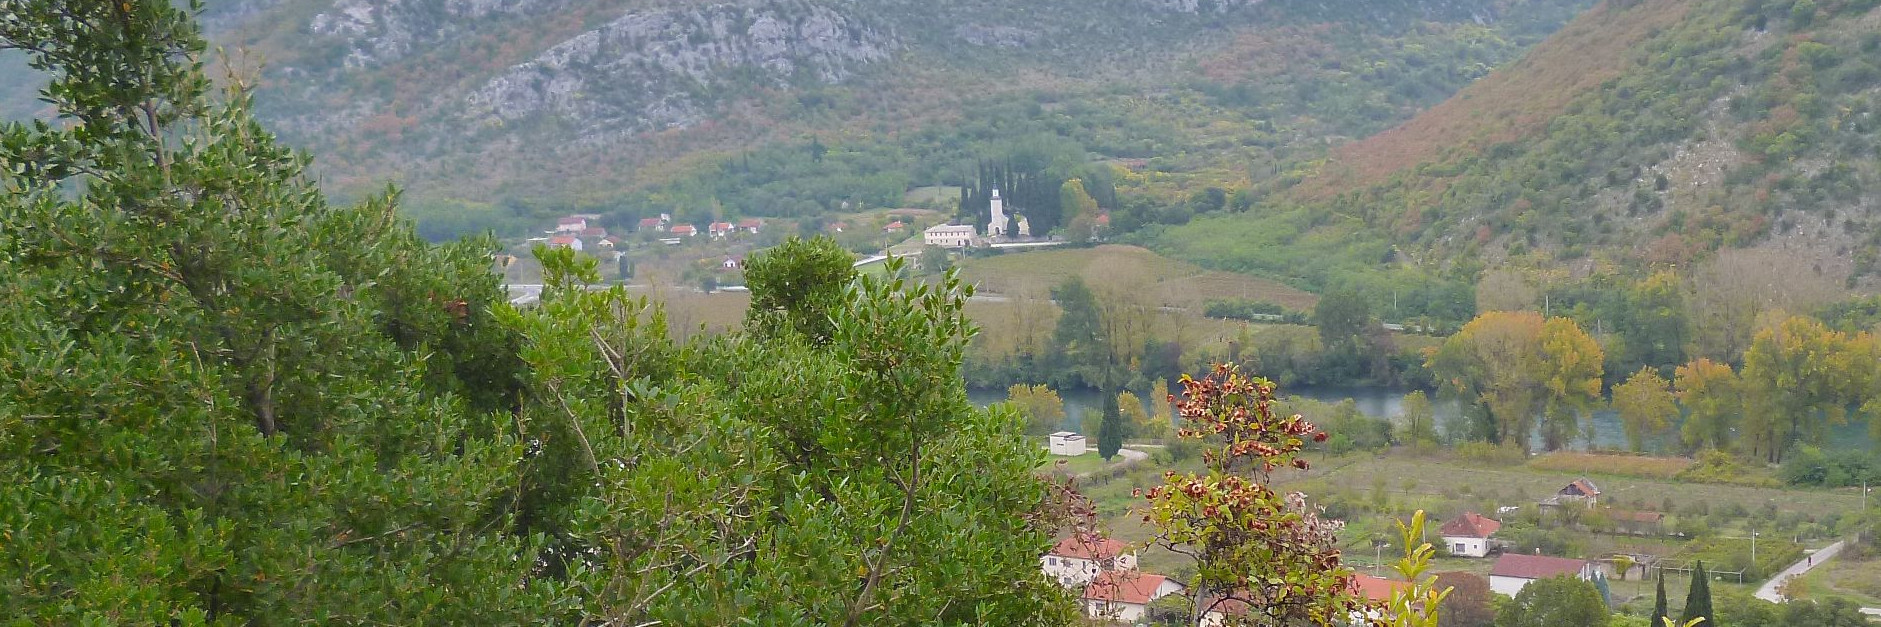 Монастырь Житомислич. Фото: Елена Арсениевич, CC BY-SA 3.0